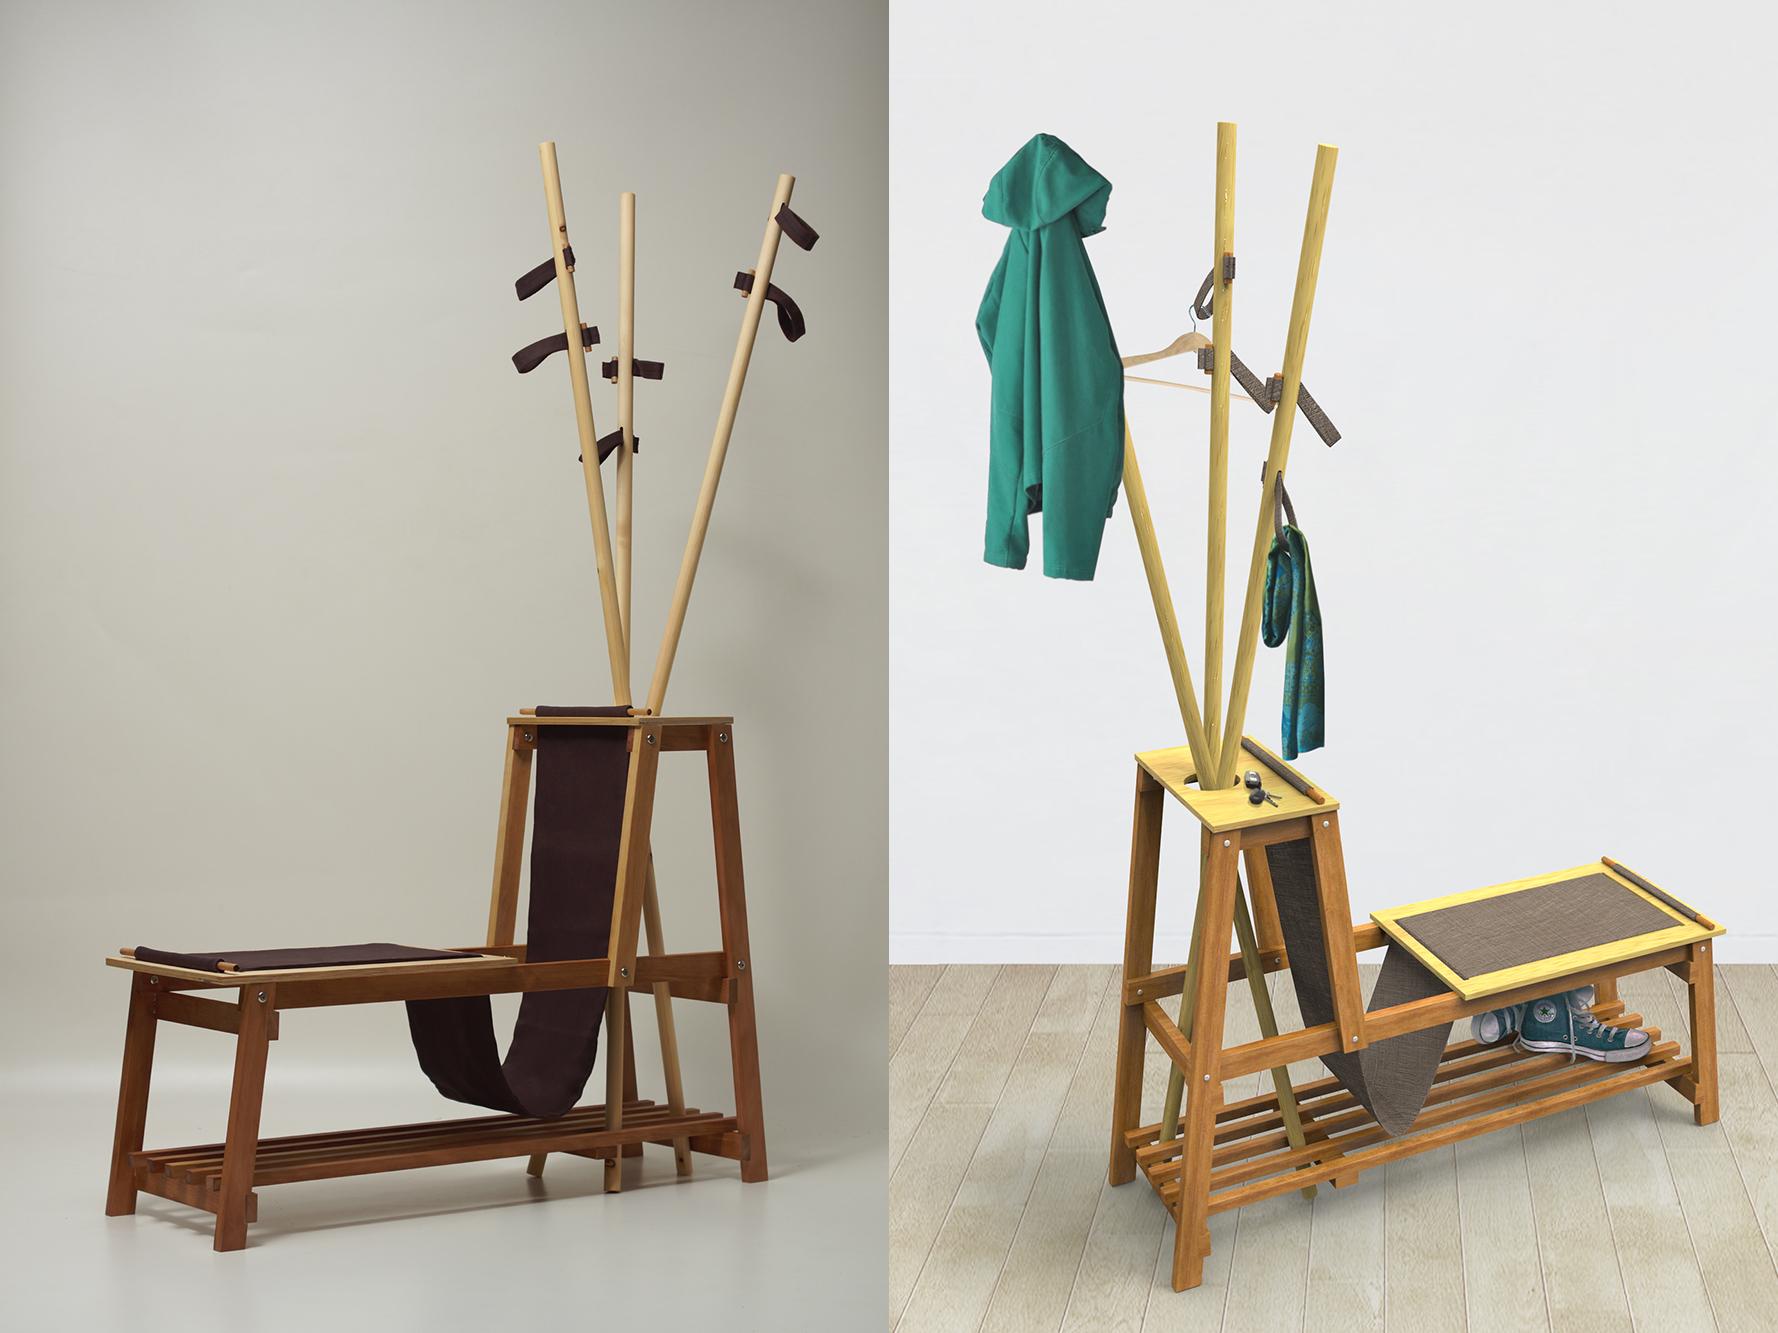 Dezső Ilona - Download Design - Bench with hanger 04.jpg